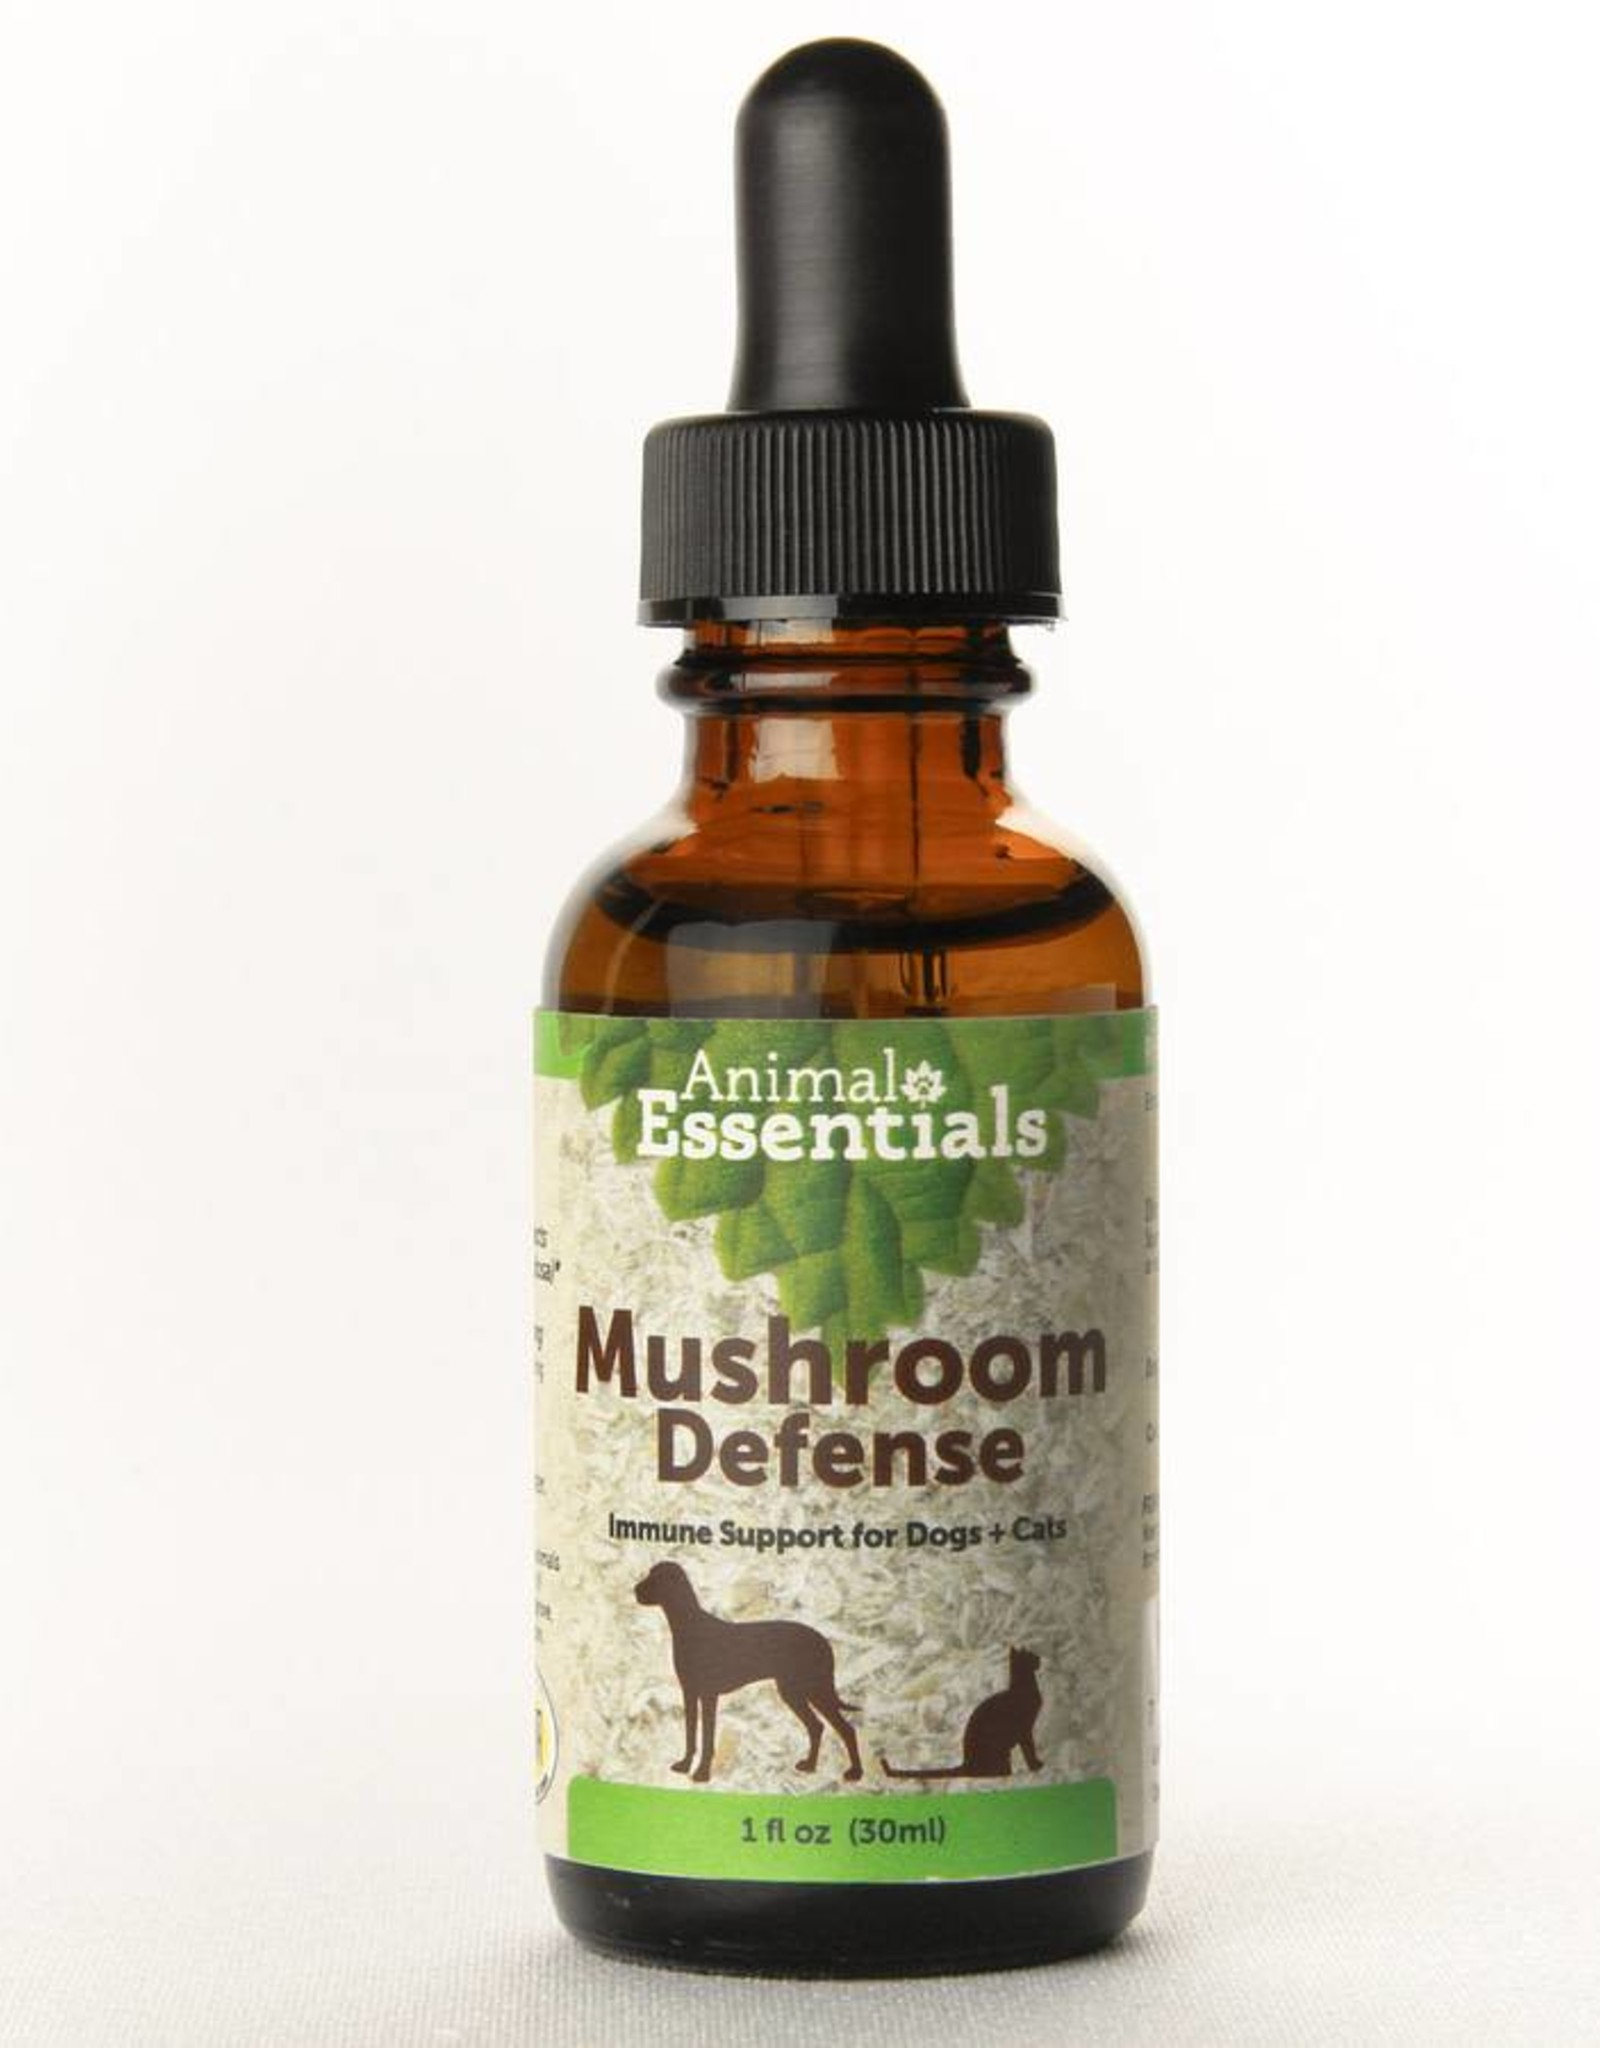 Animal Essentials Animal Essentials Mushroom Defense 1oz